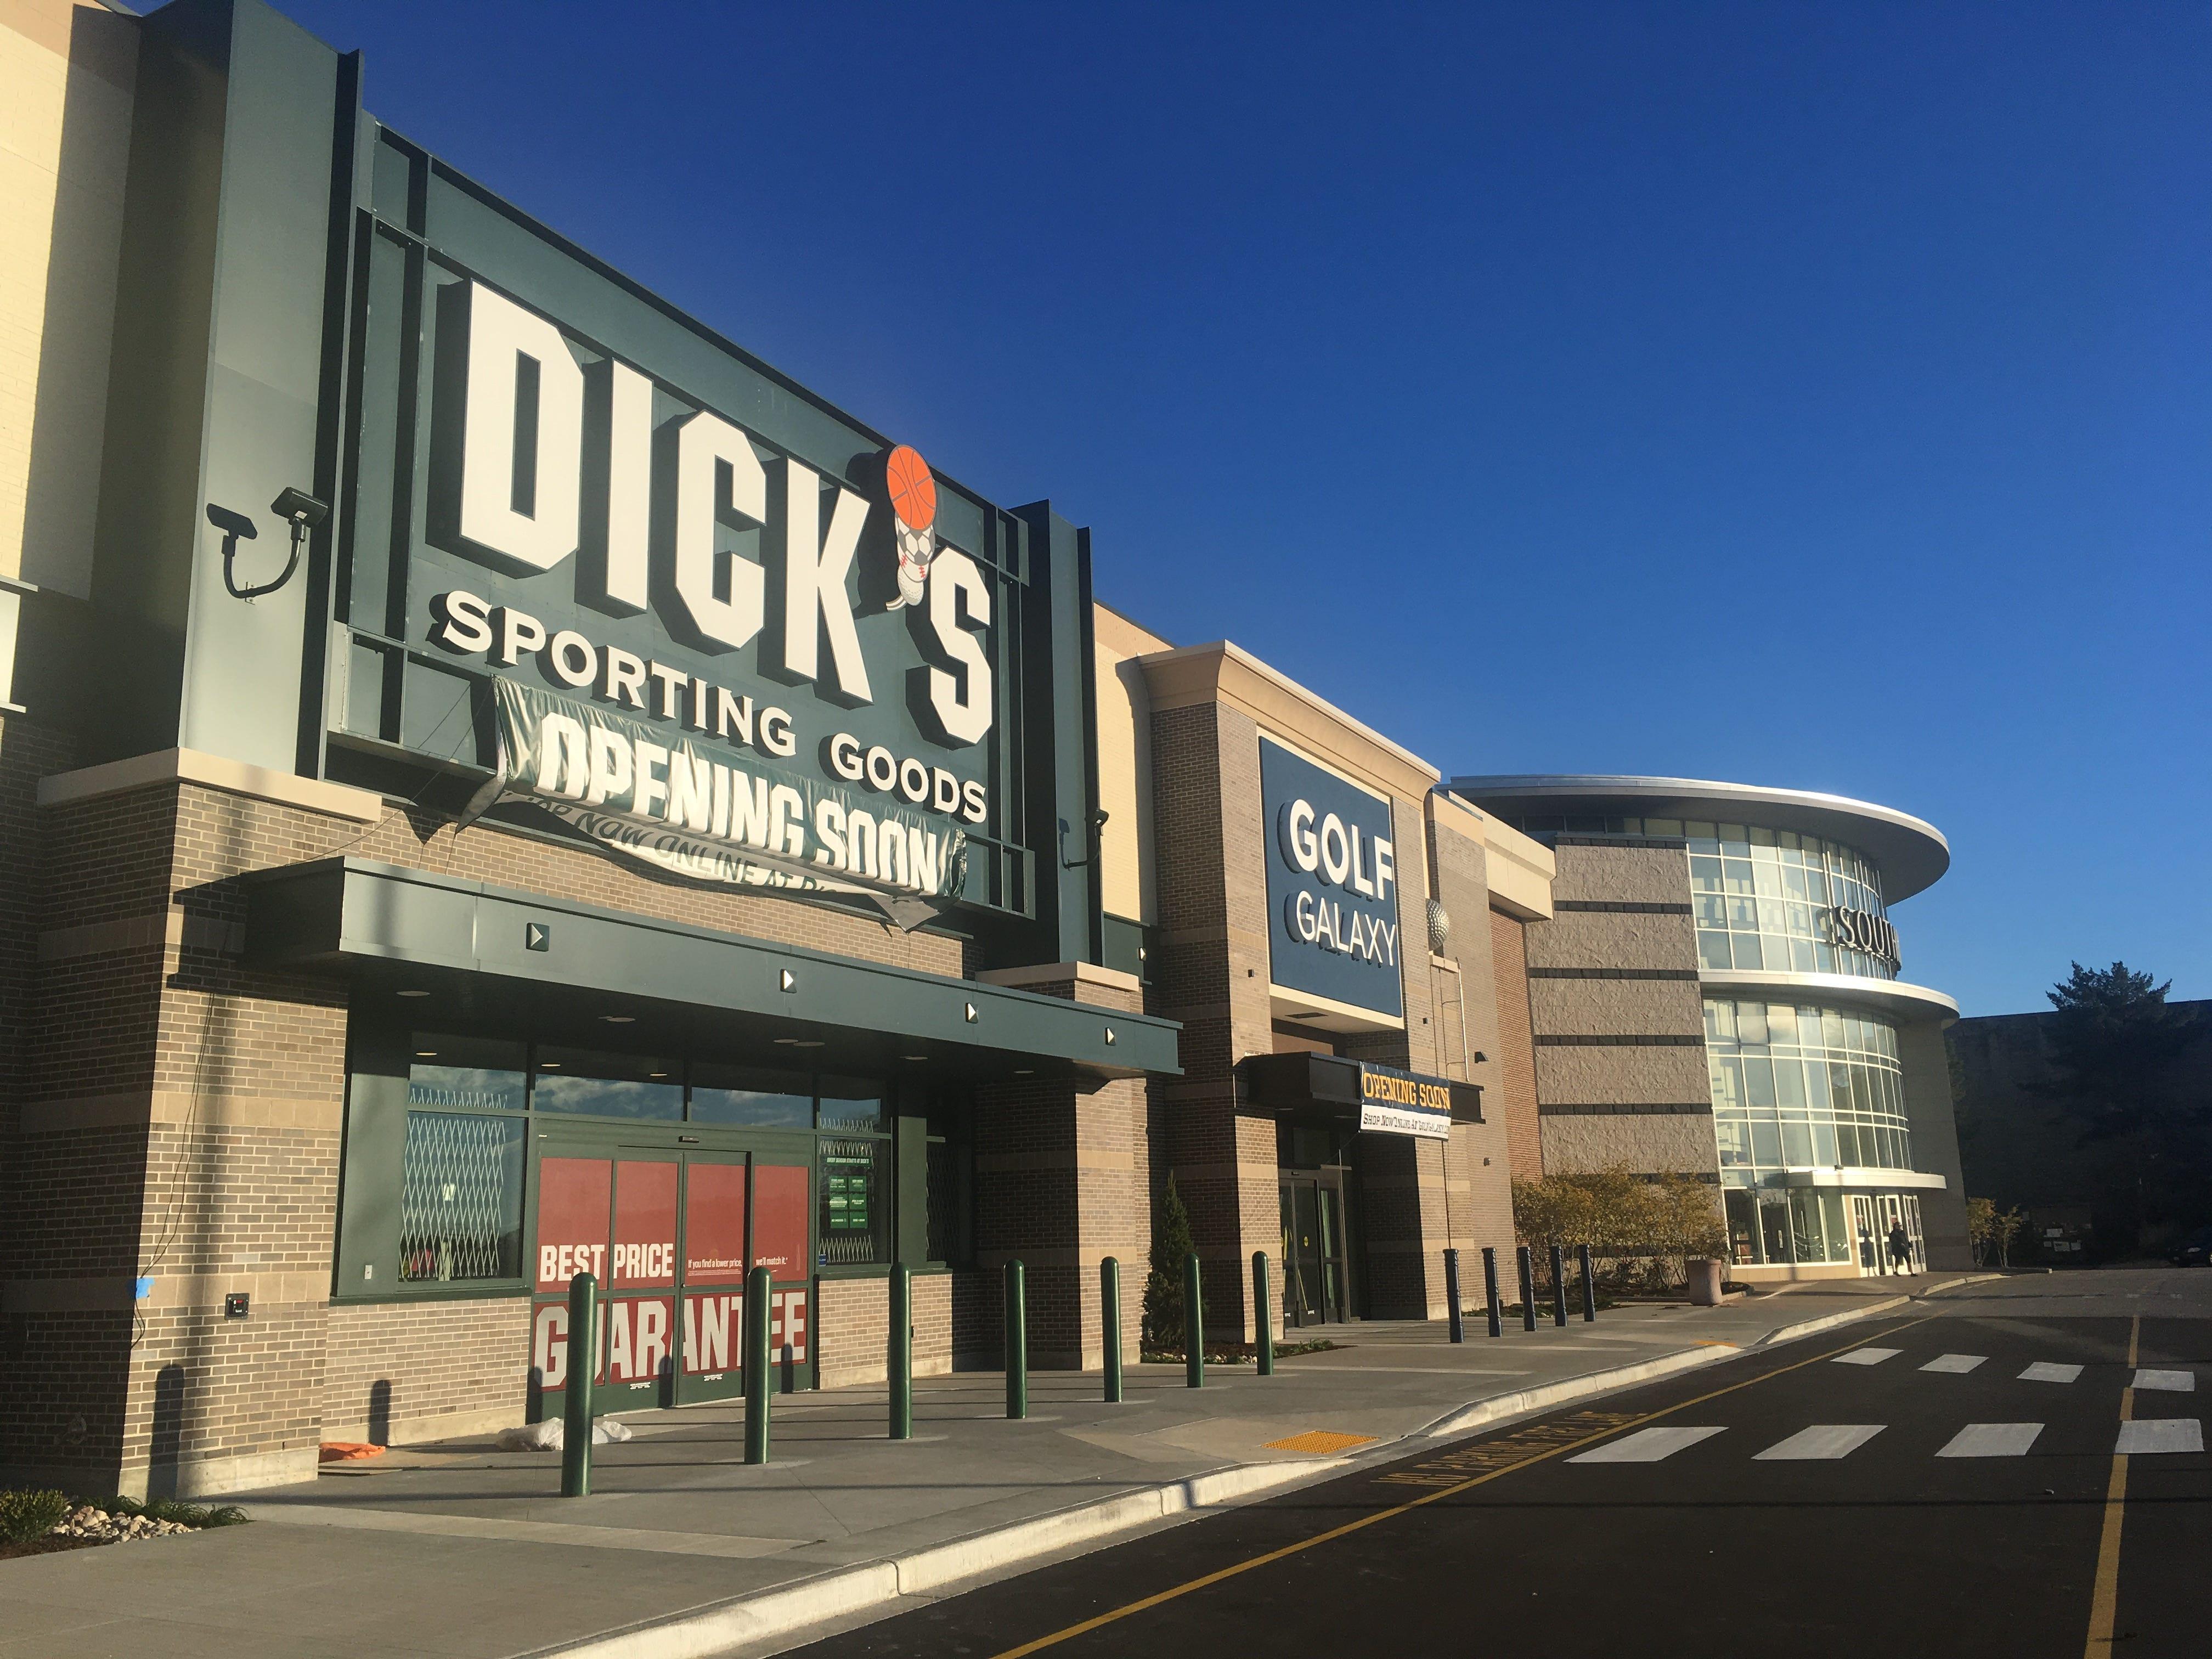 Dicks sportlng goods